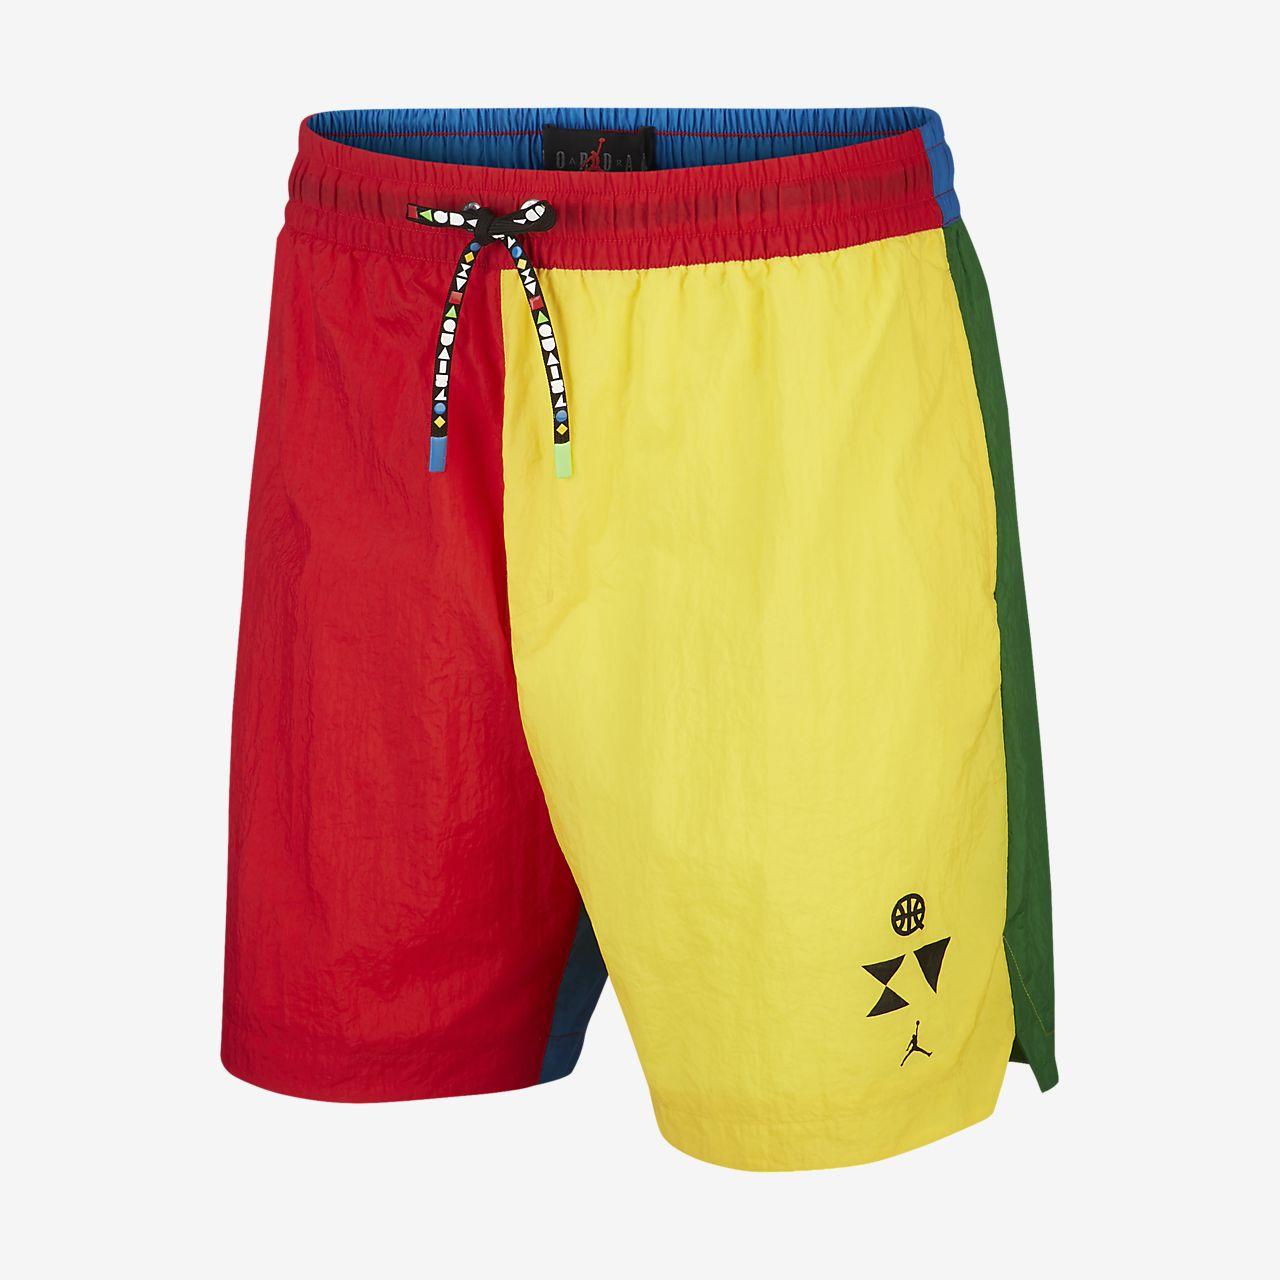 Męskie spodenki basenowe Jordan Quai54